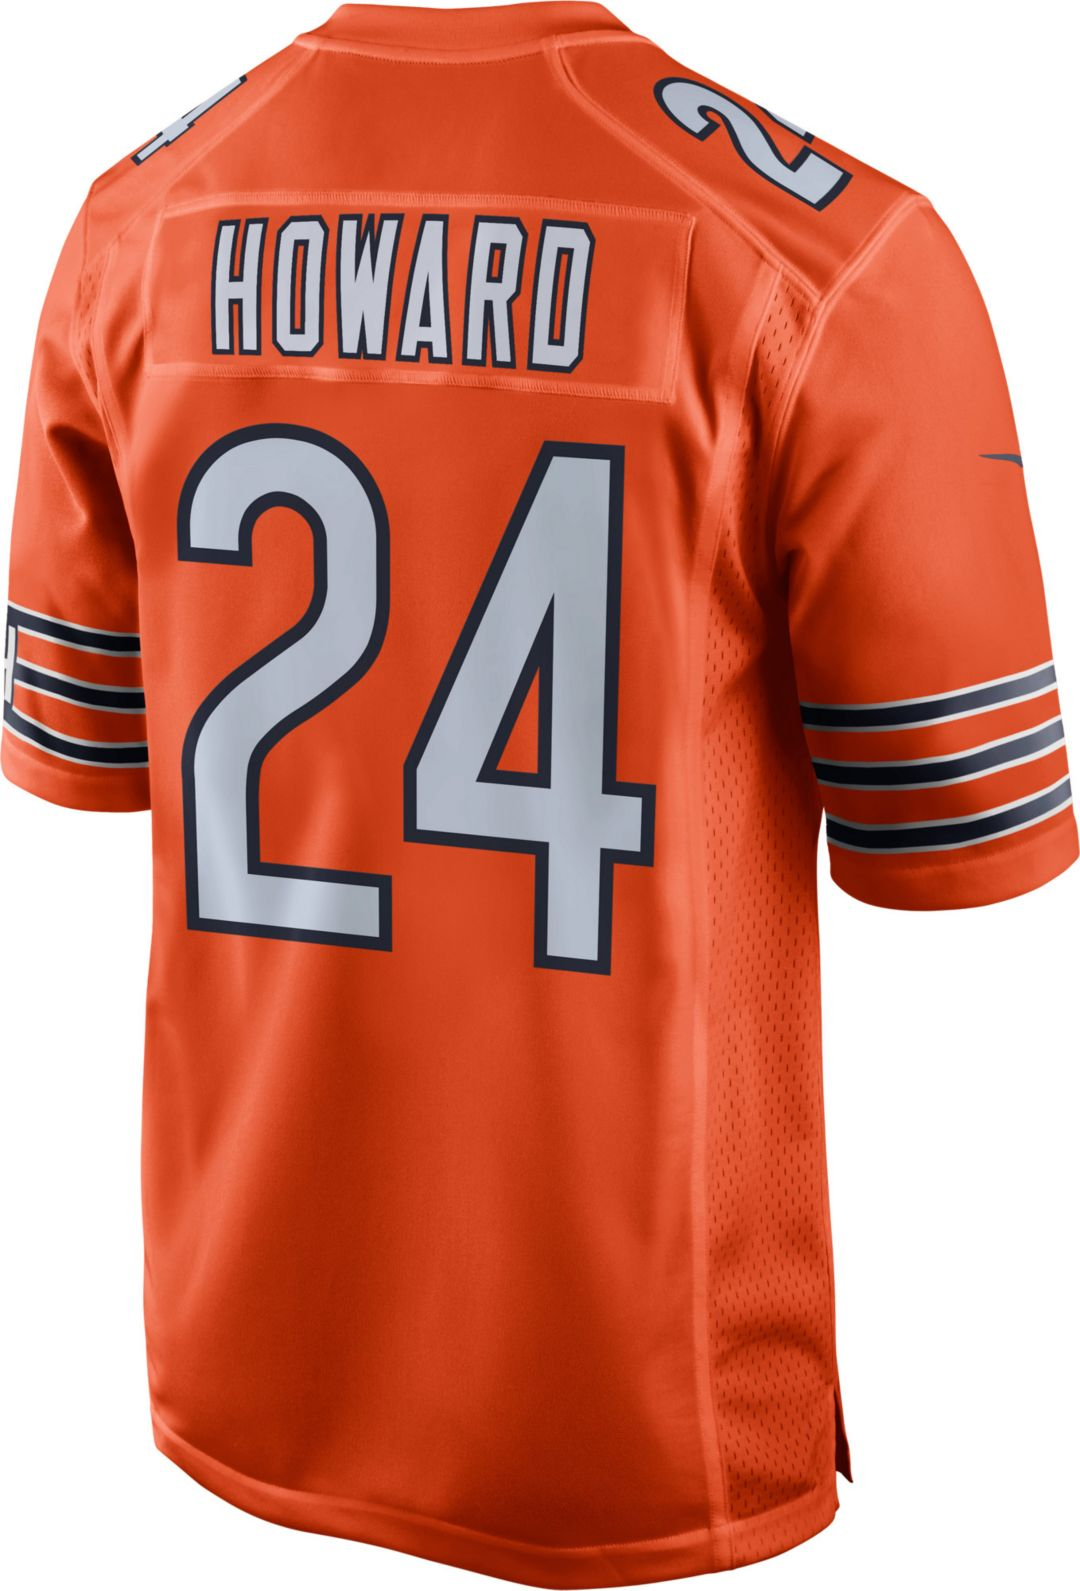 c47d68362fa Nike Youth Alternate Game Jersey Chicago Bears Jordan Howard #24 ...